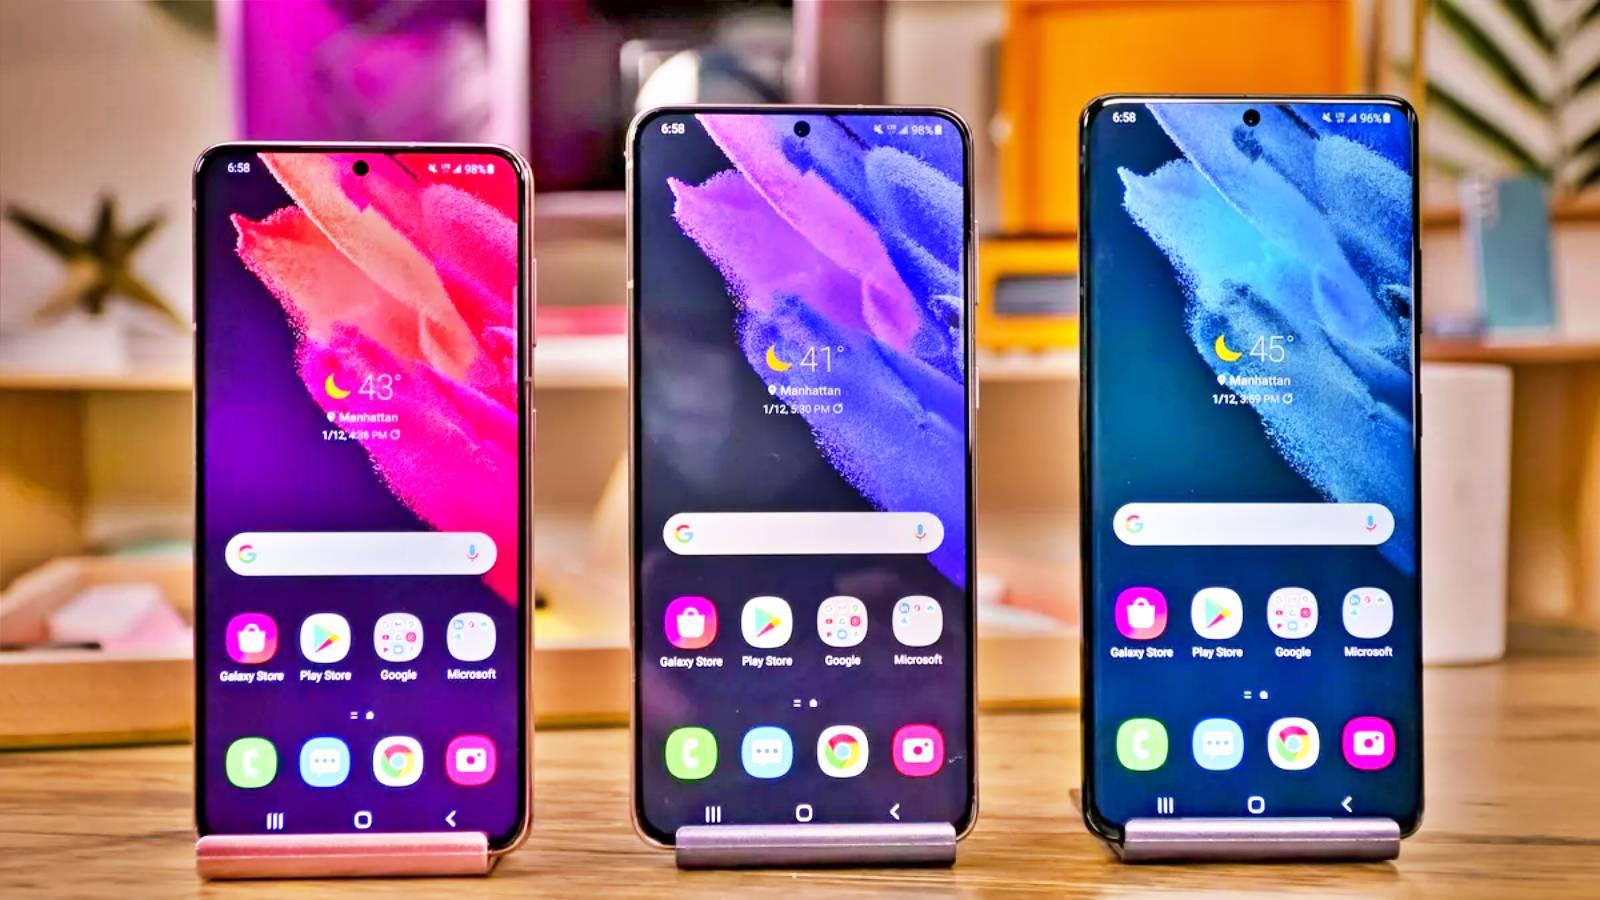 Samsung Galaxy S21 Imag Discounts 1000 LEI